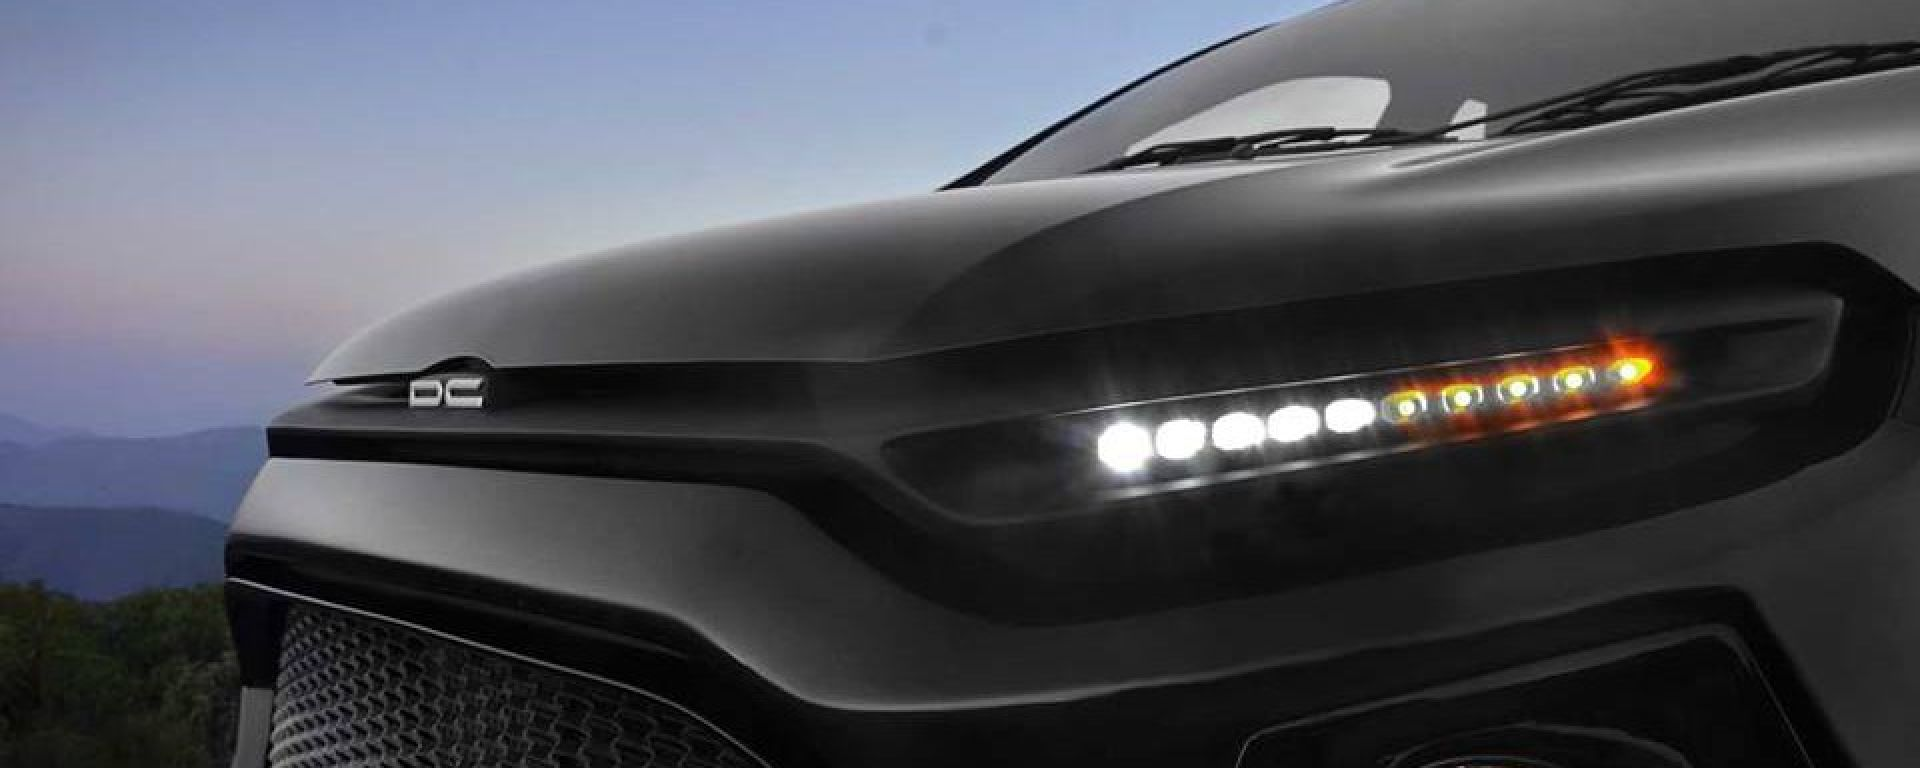 Ford EcoSport DC Design